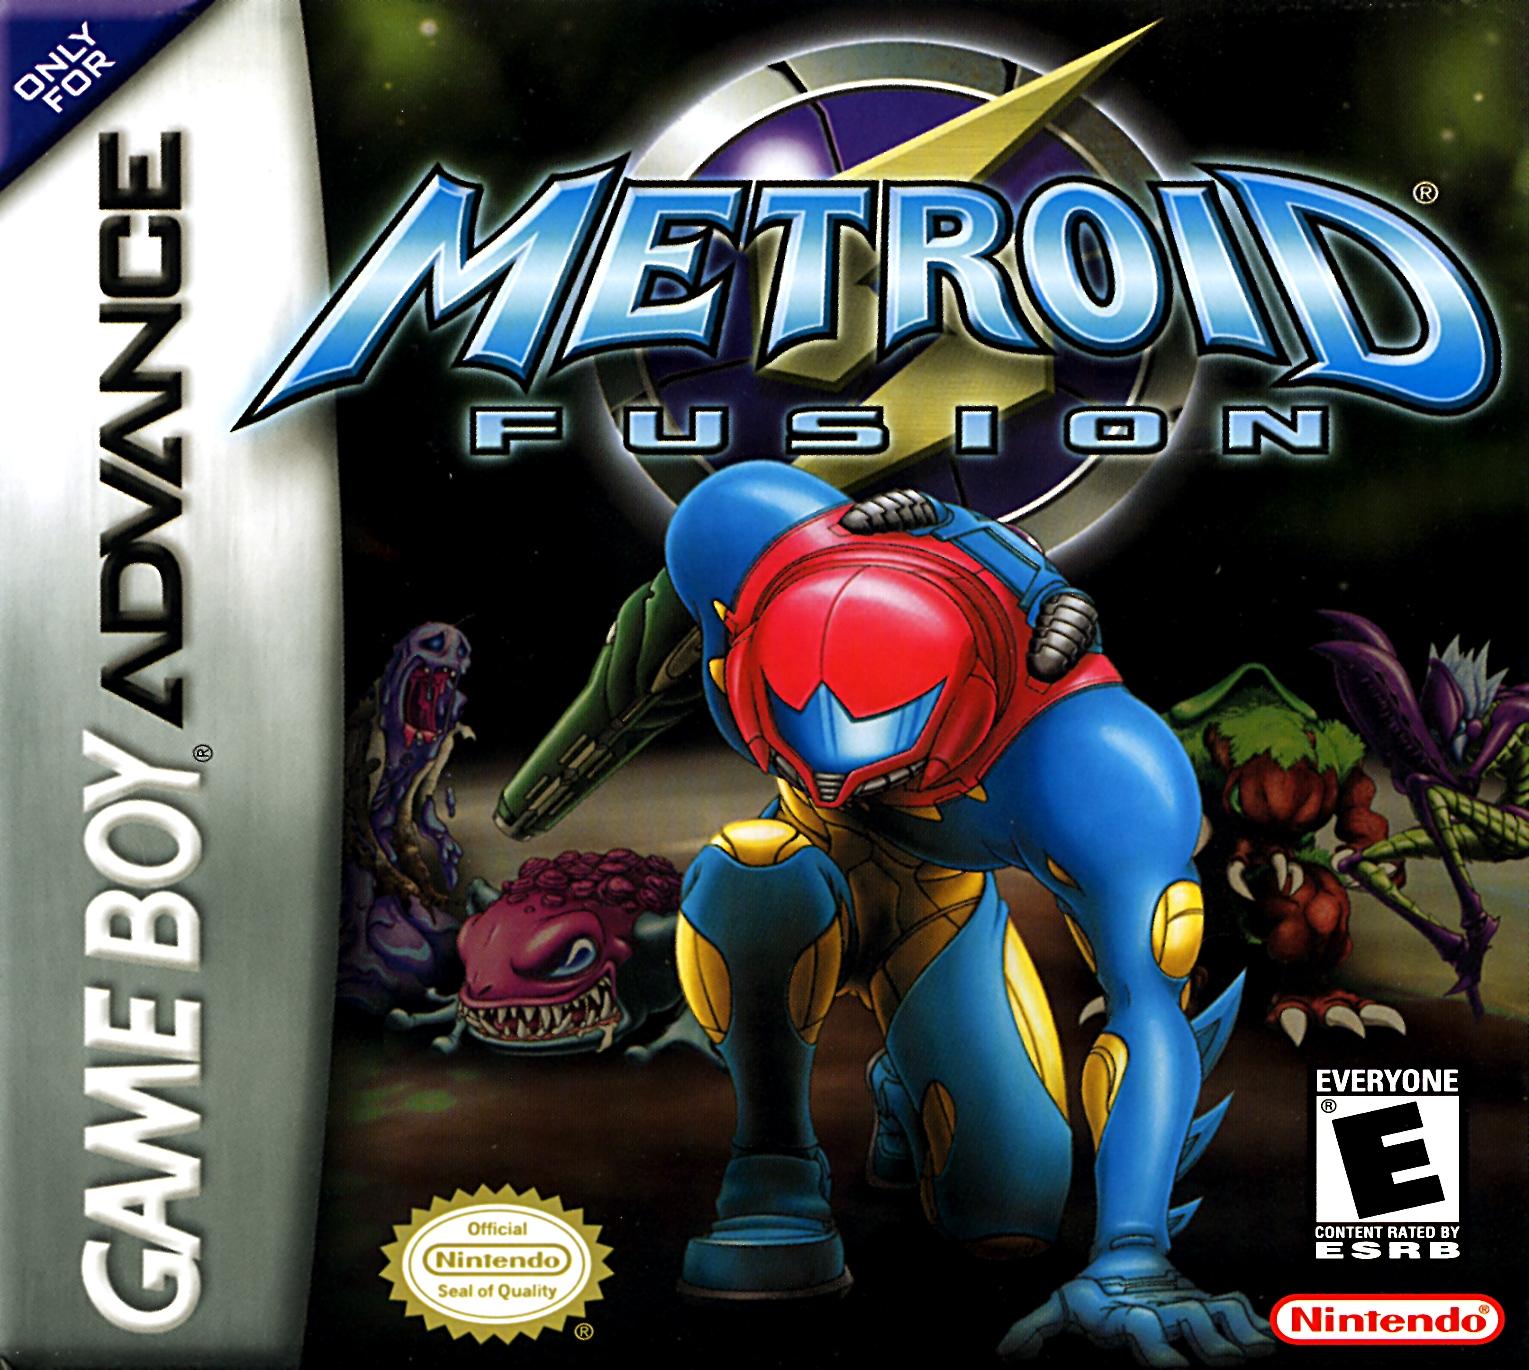 Game boy color quanto custa - Metroid Fusion Pt Br Download